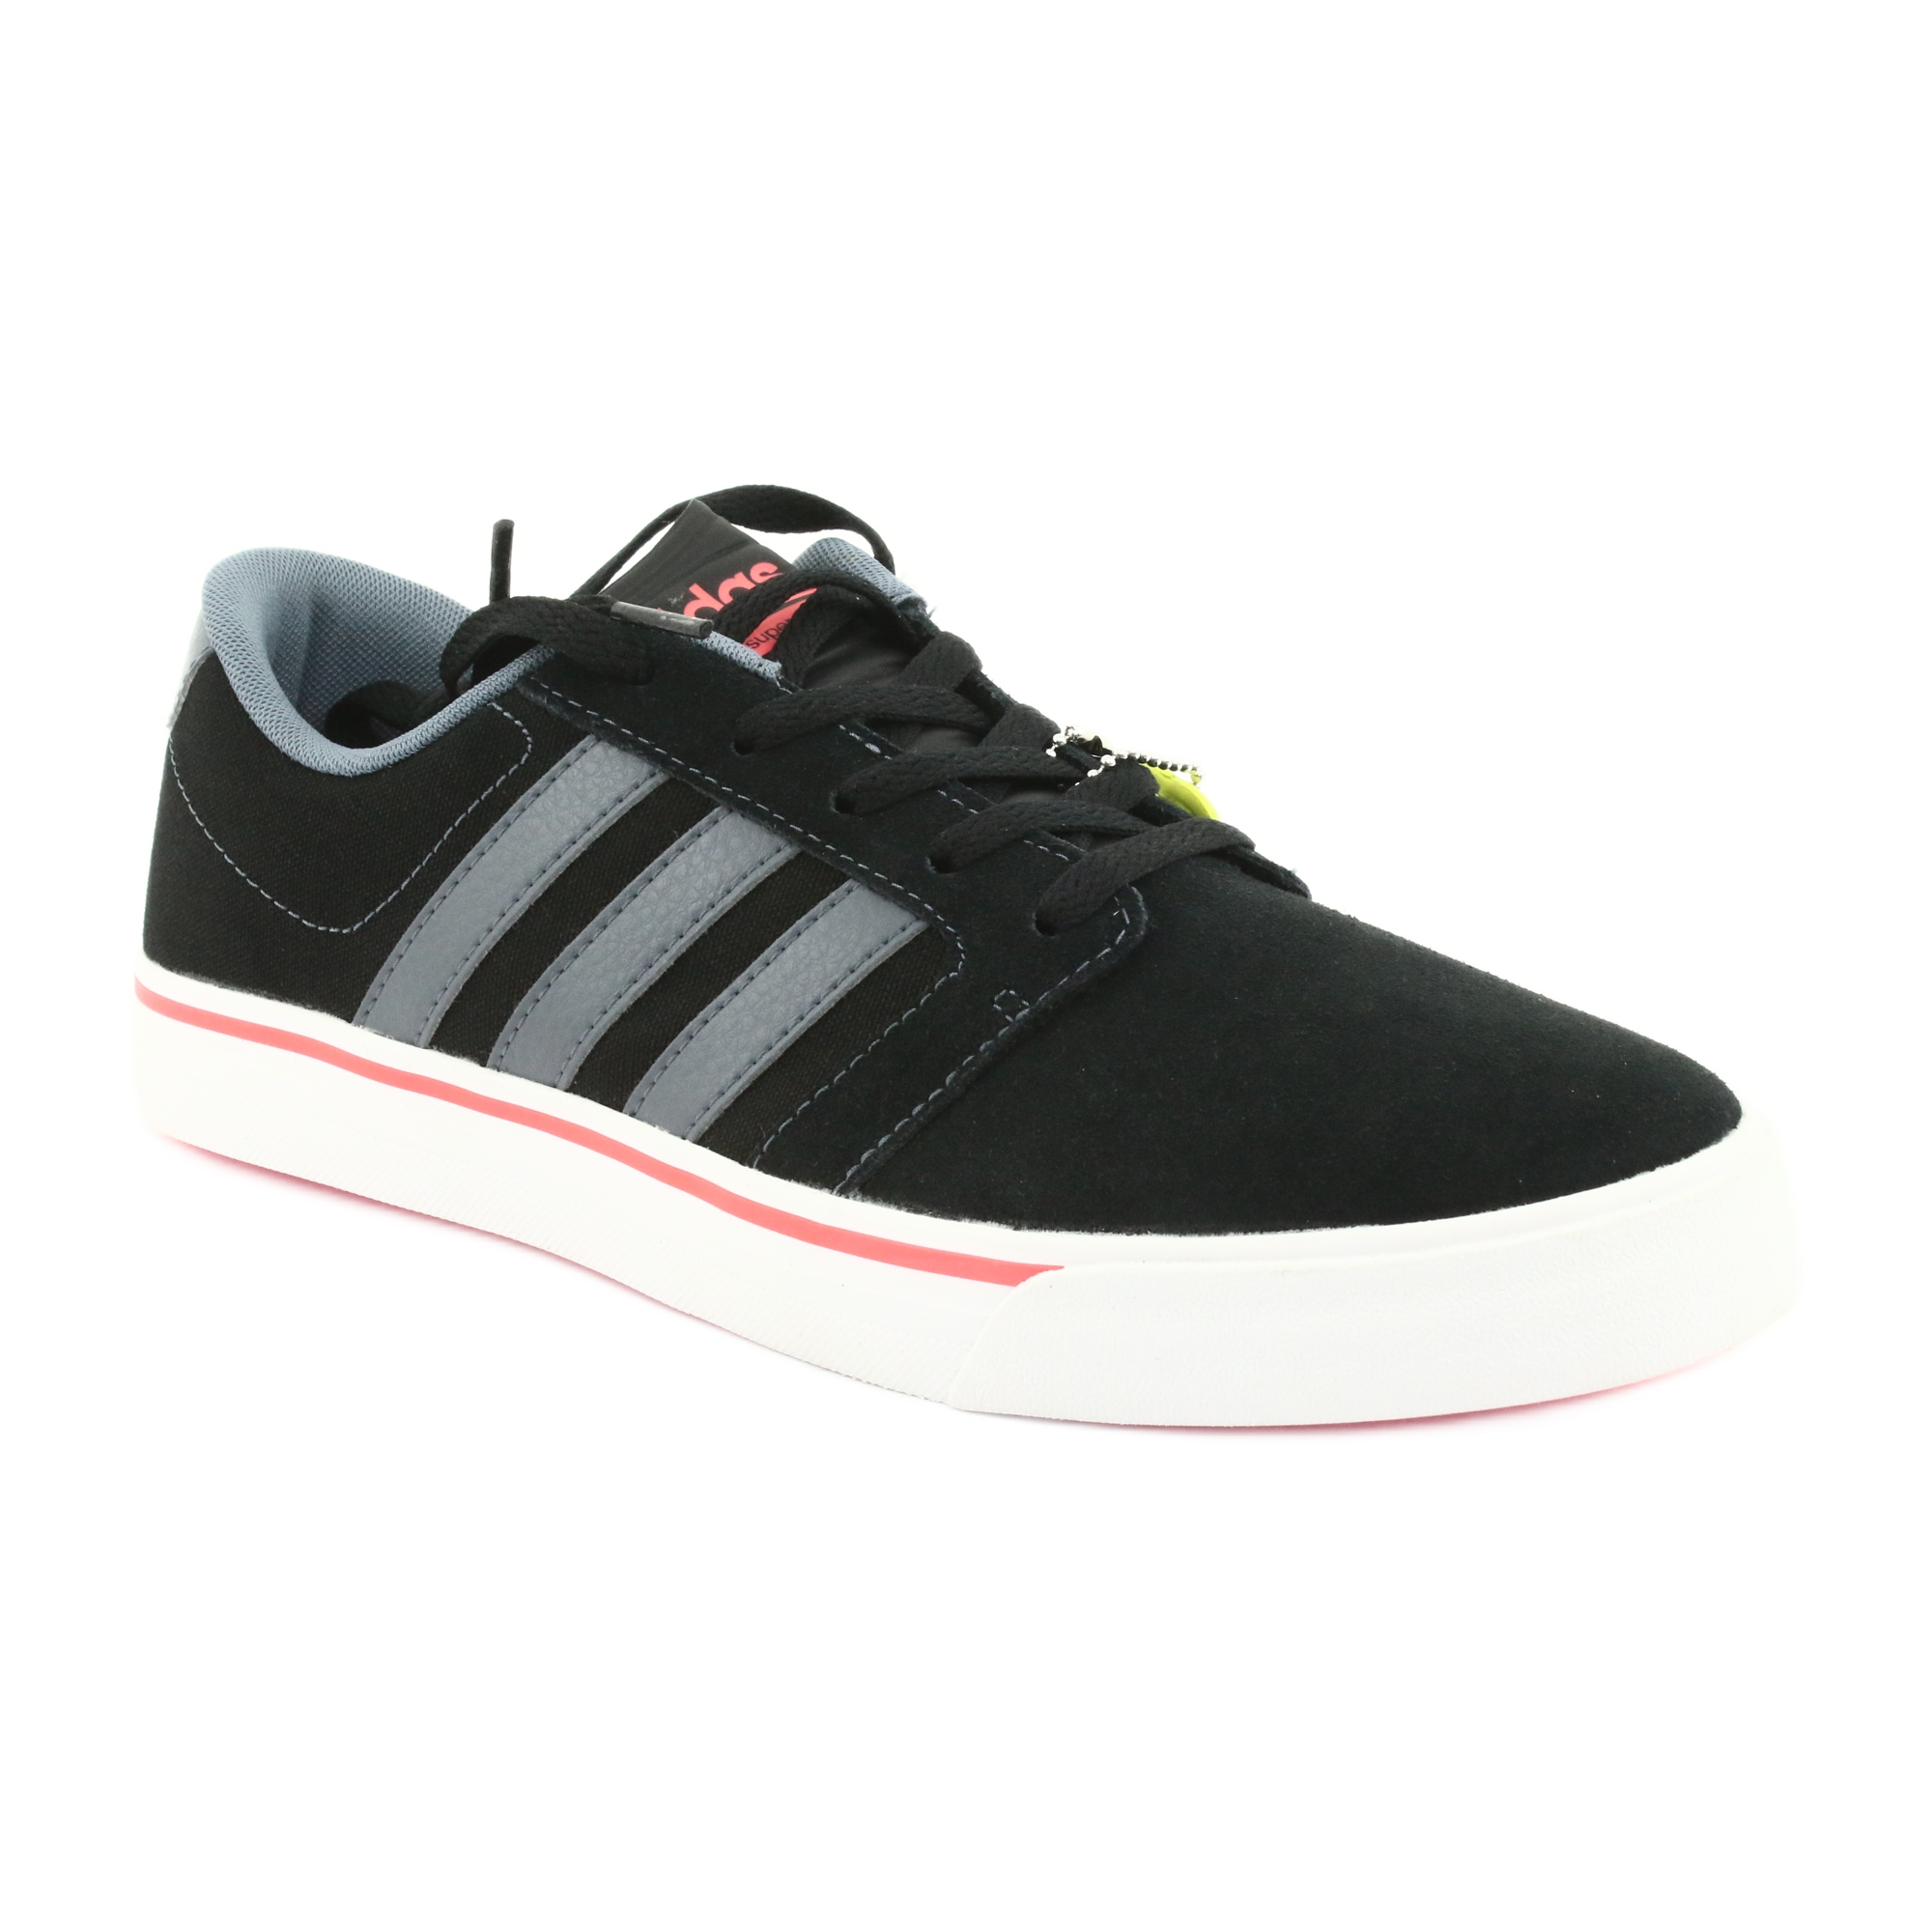 Adidas Cloudfoam Super Skate M AW3896 shoes black orange grey